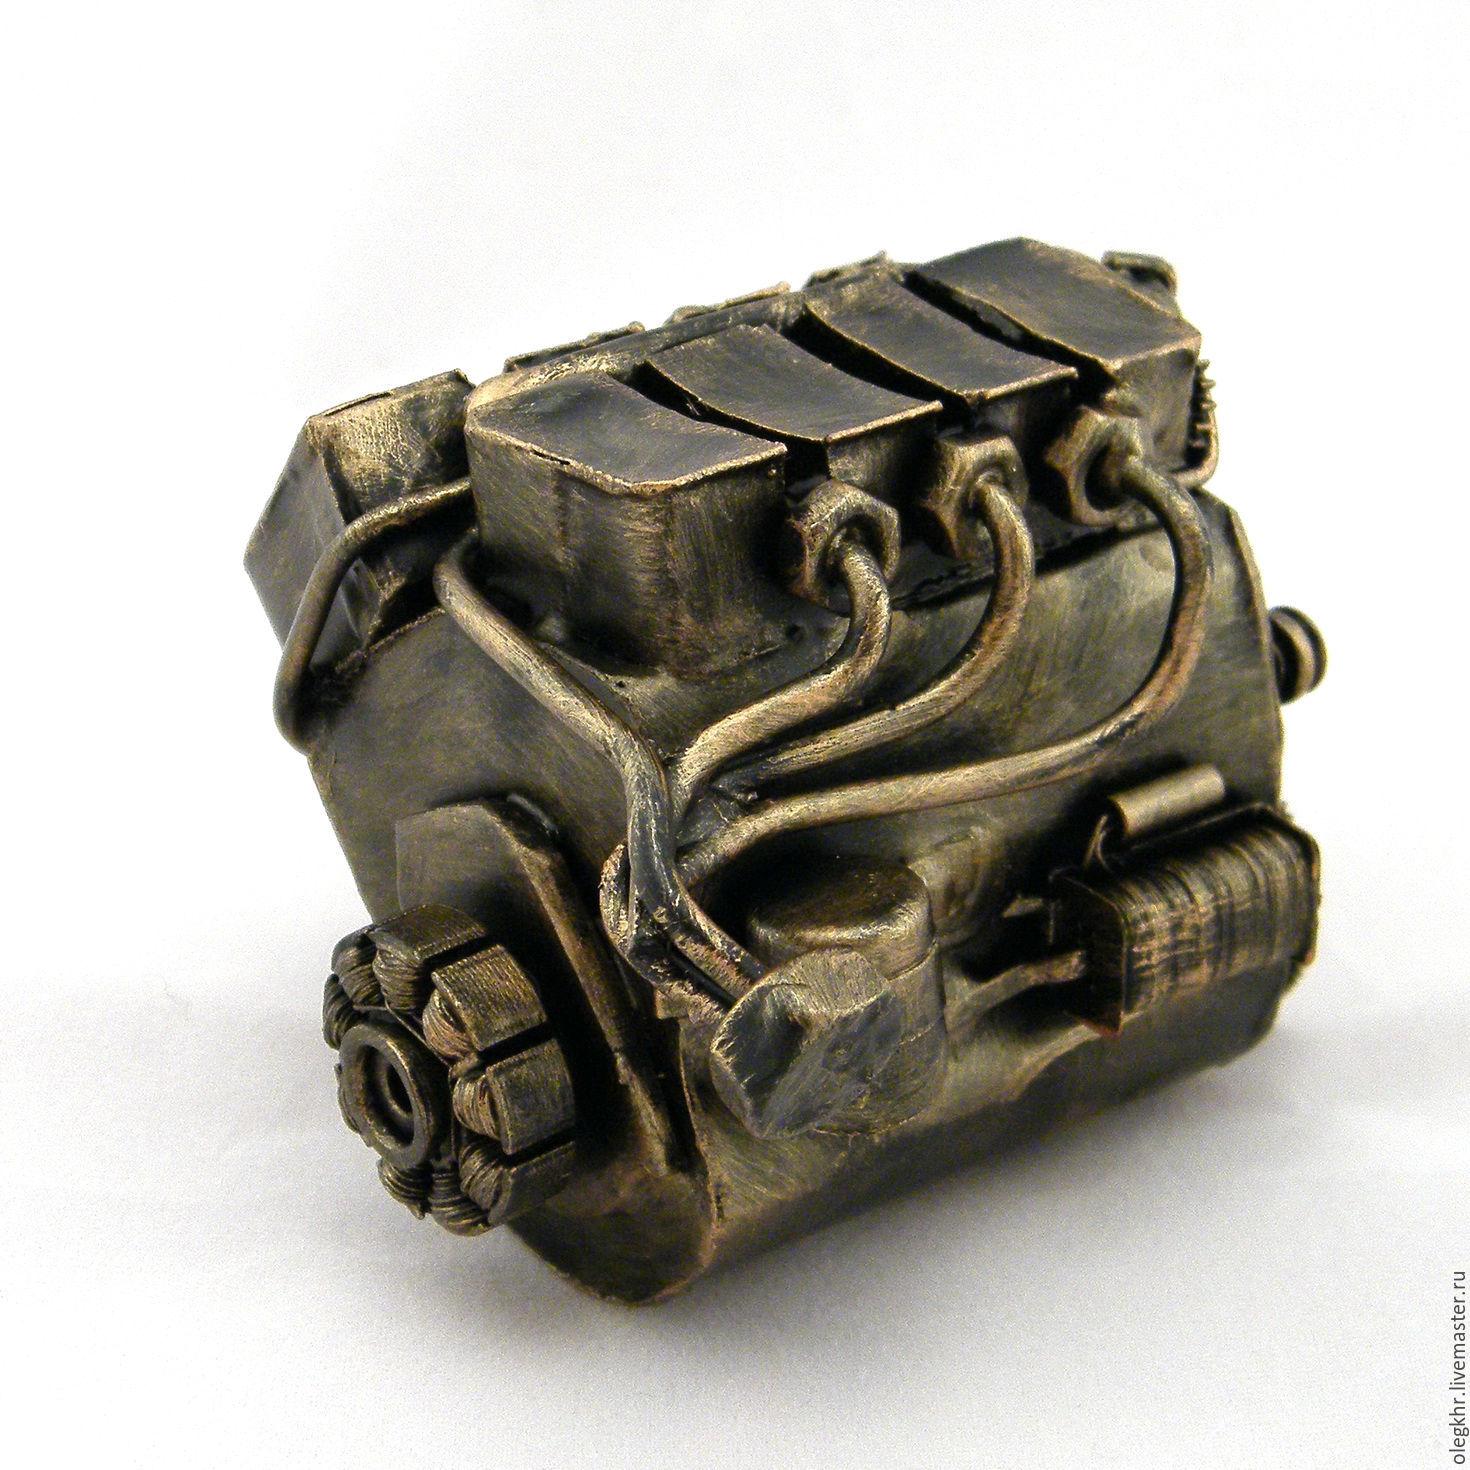 Buy Land Rover Mechanic on Livemaster online shop